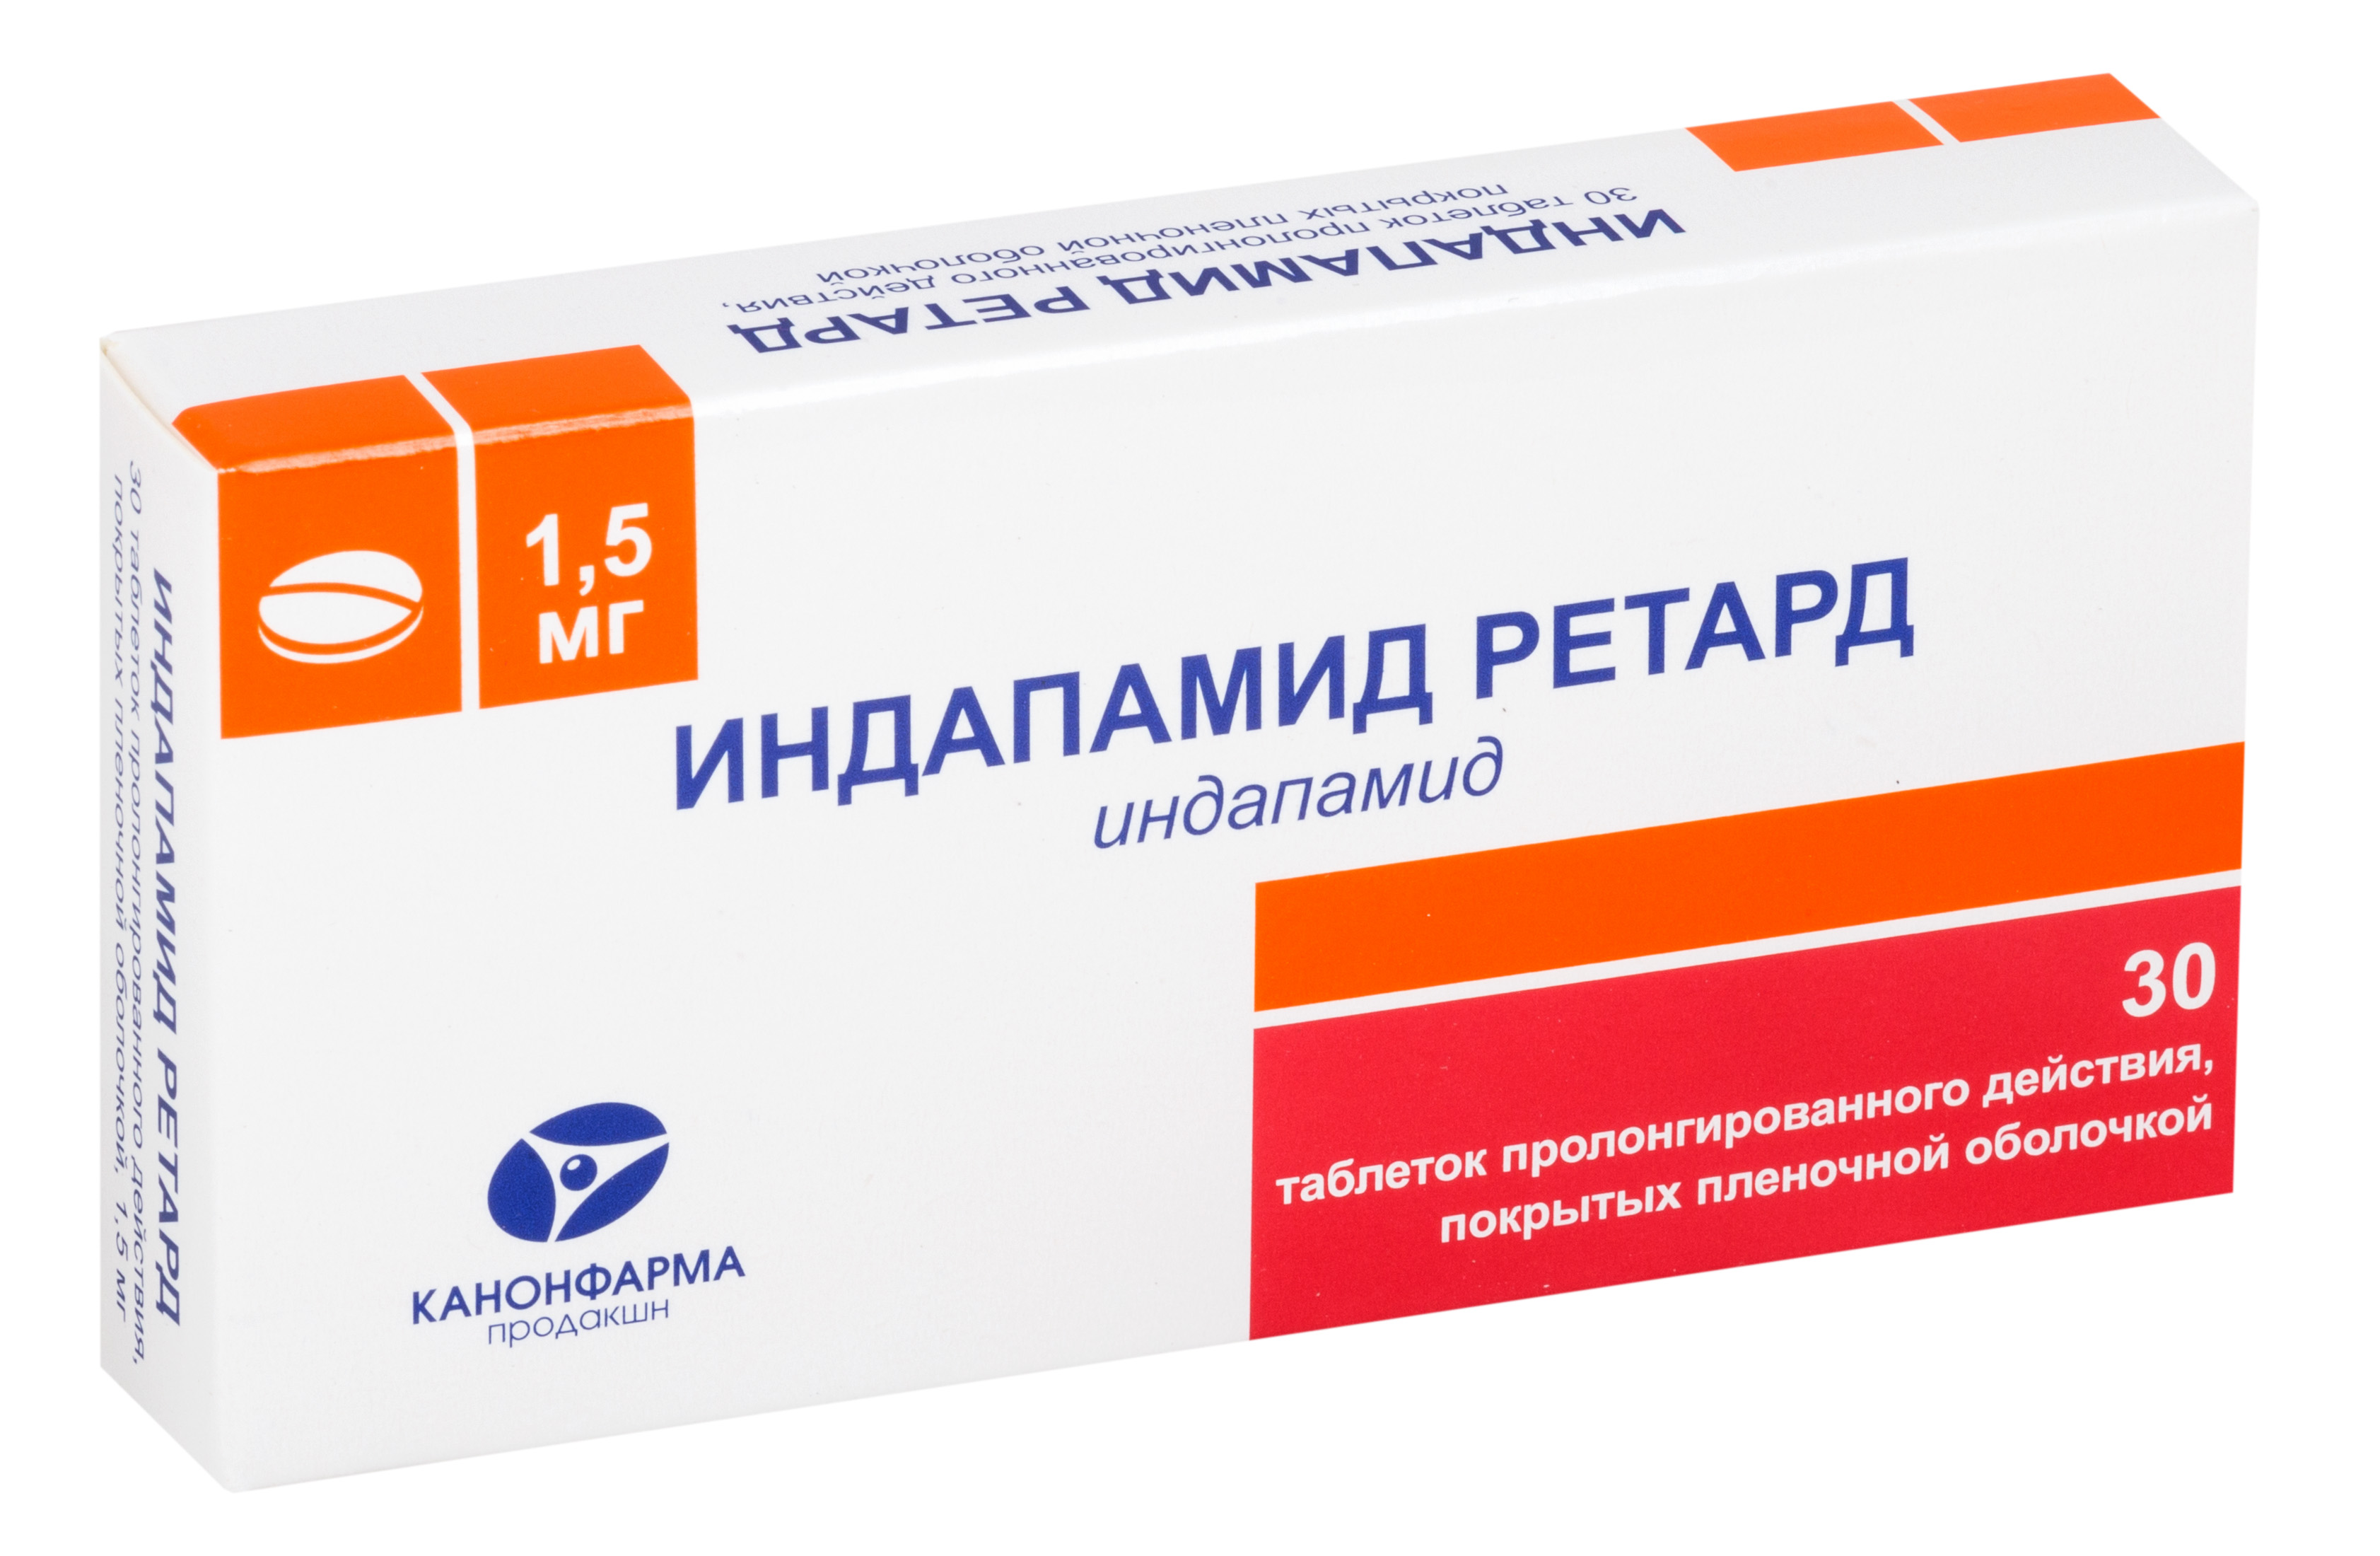 Индапамид ретард таблетки пролонг.п.п.о. 1,5мг №30 Канонфарма